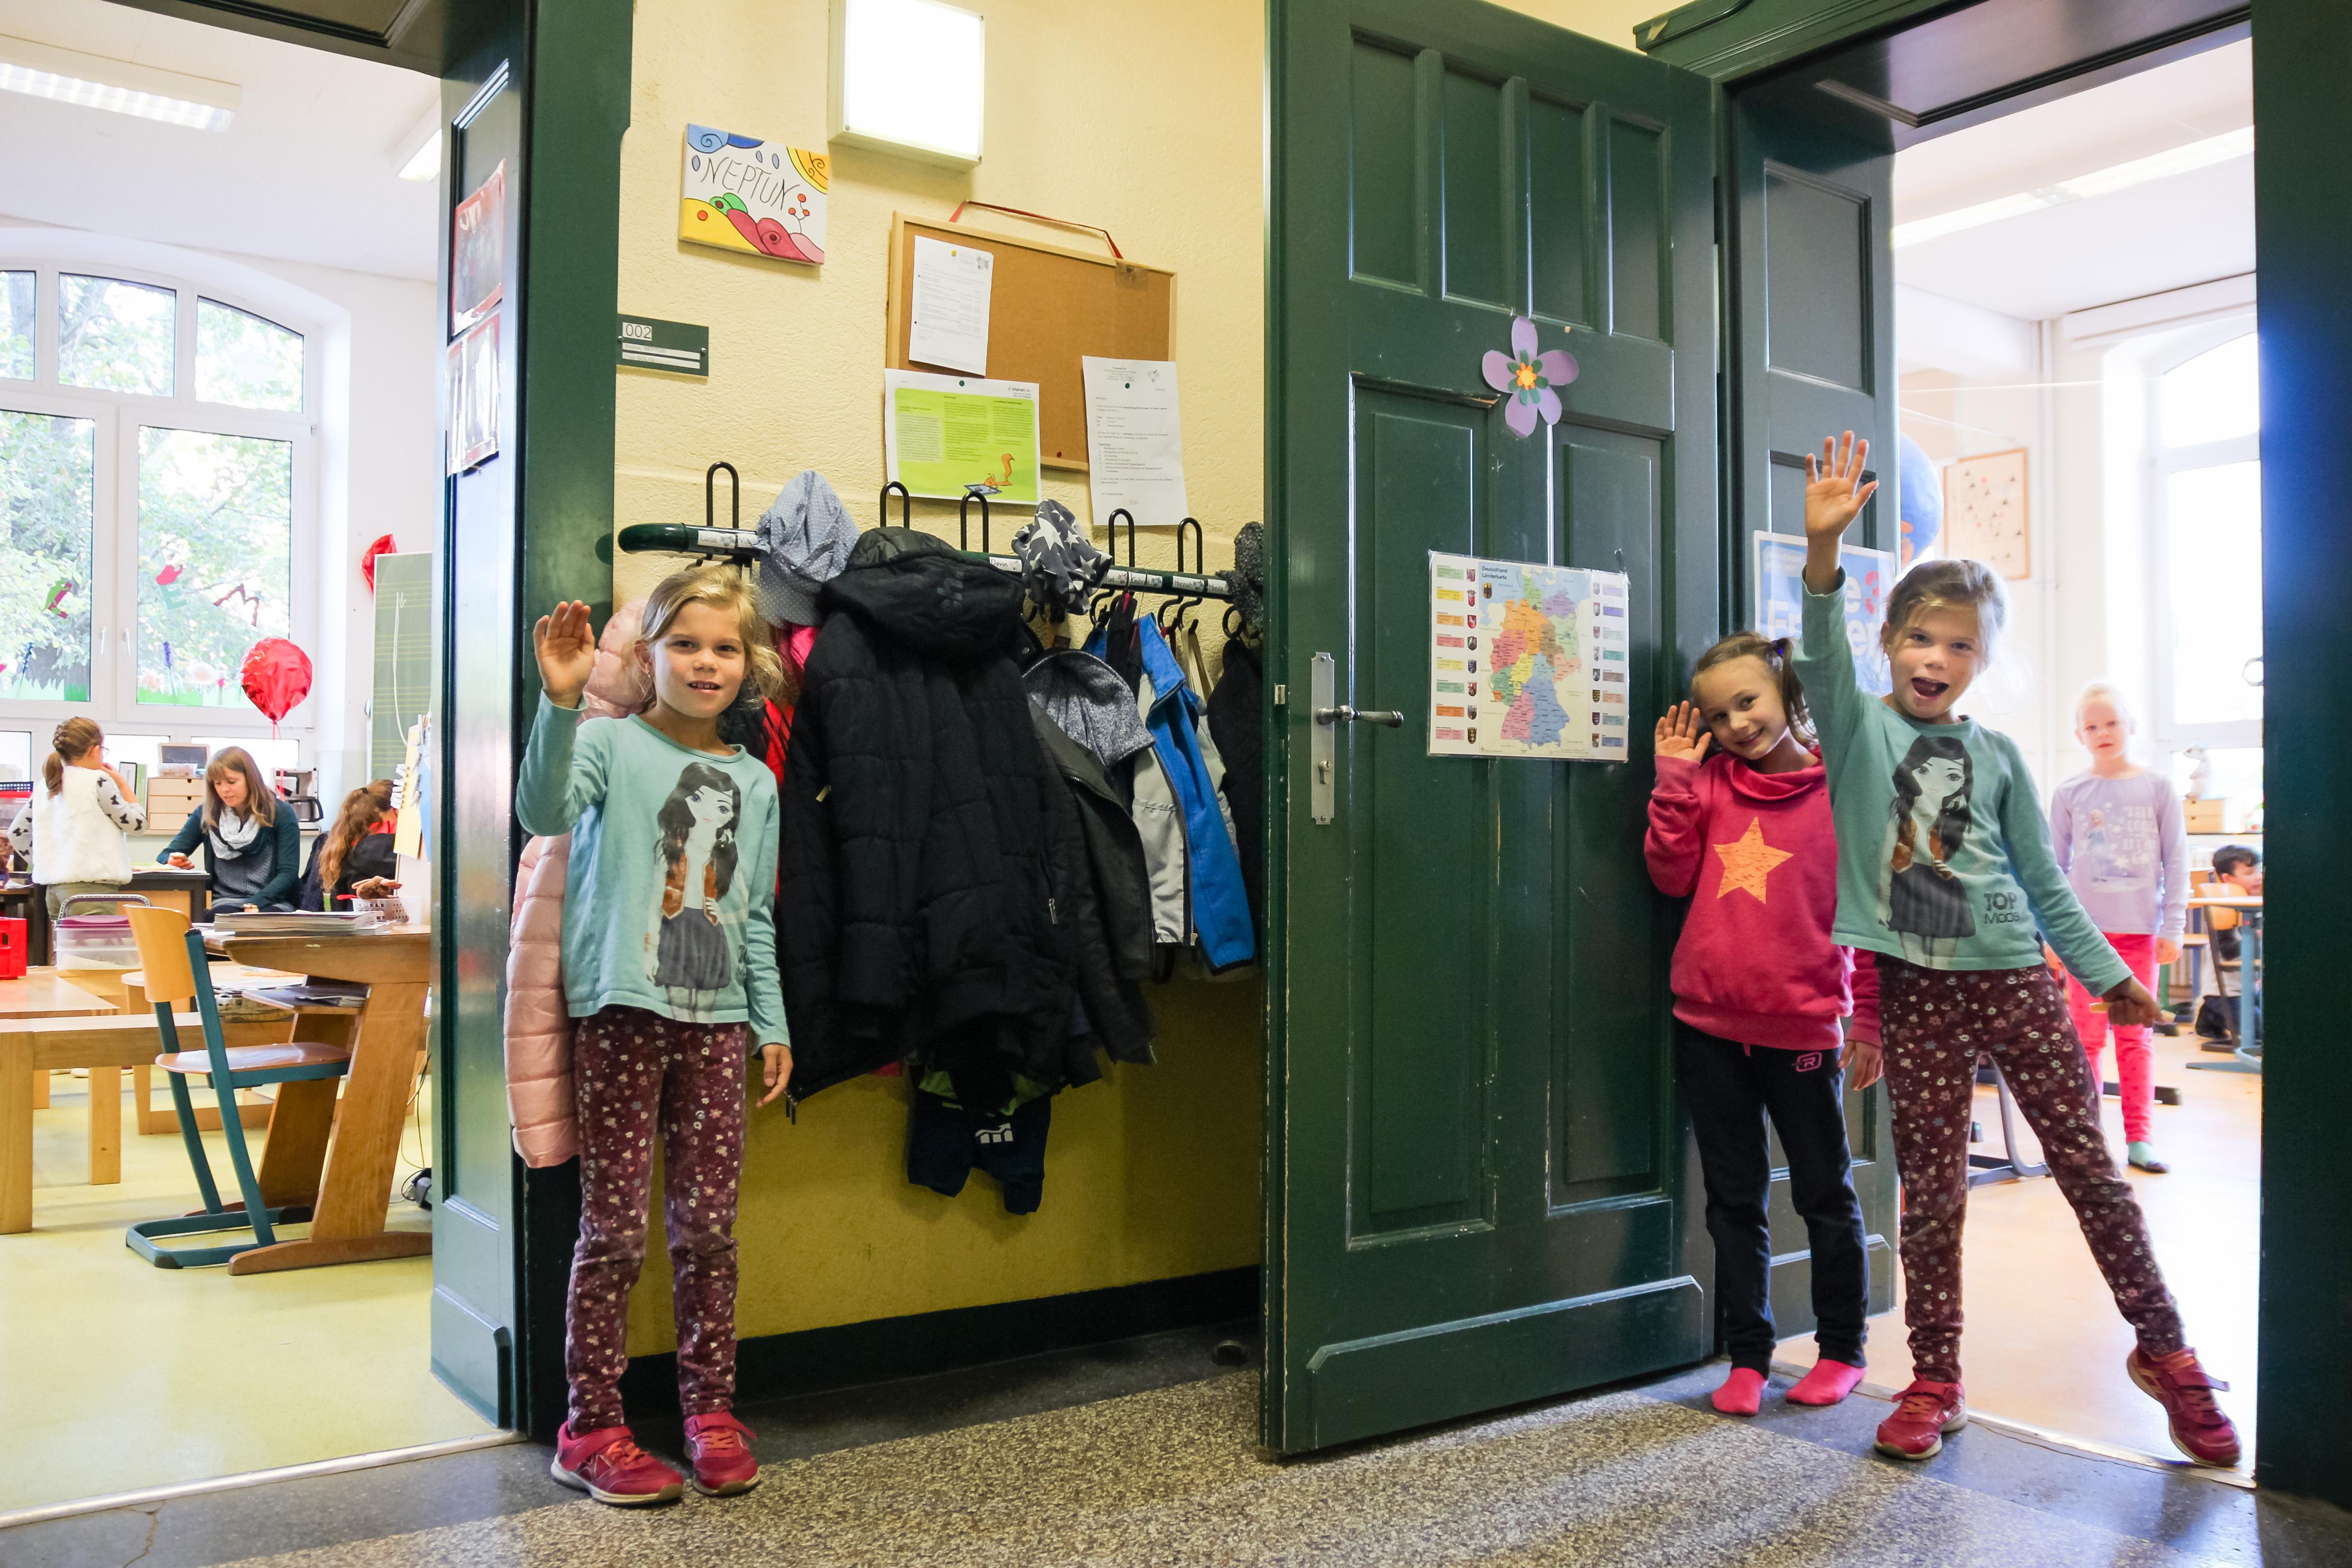 http://friedensschule.schulen-dormagen.de/wp-content/uploads/2017/09/Img_8750_a.jpg